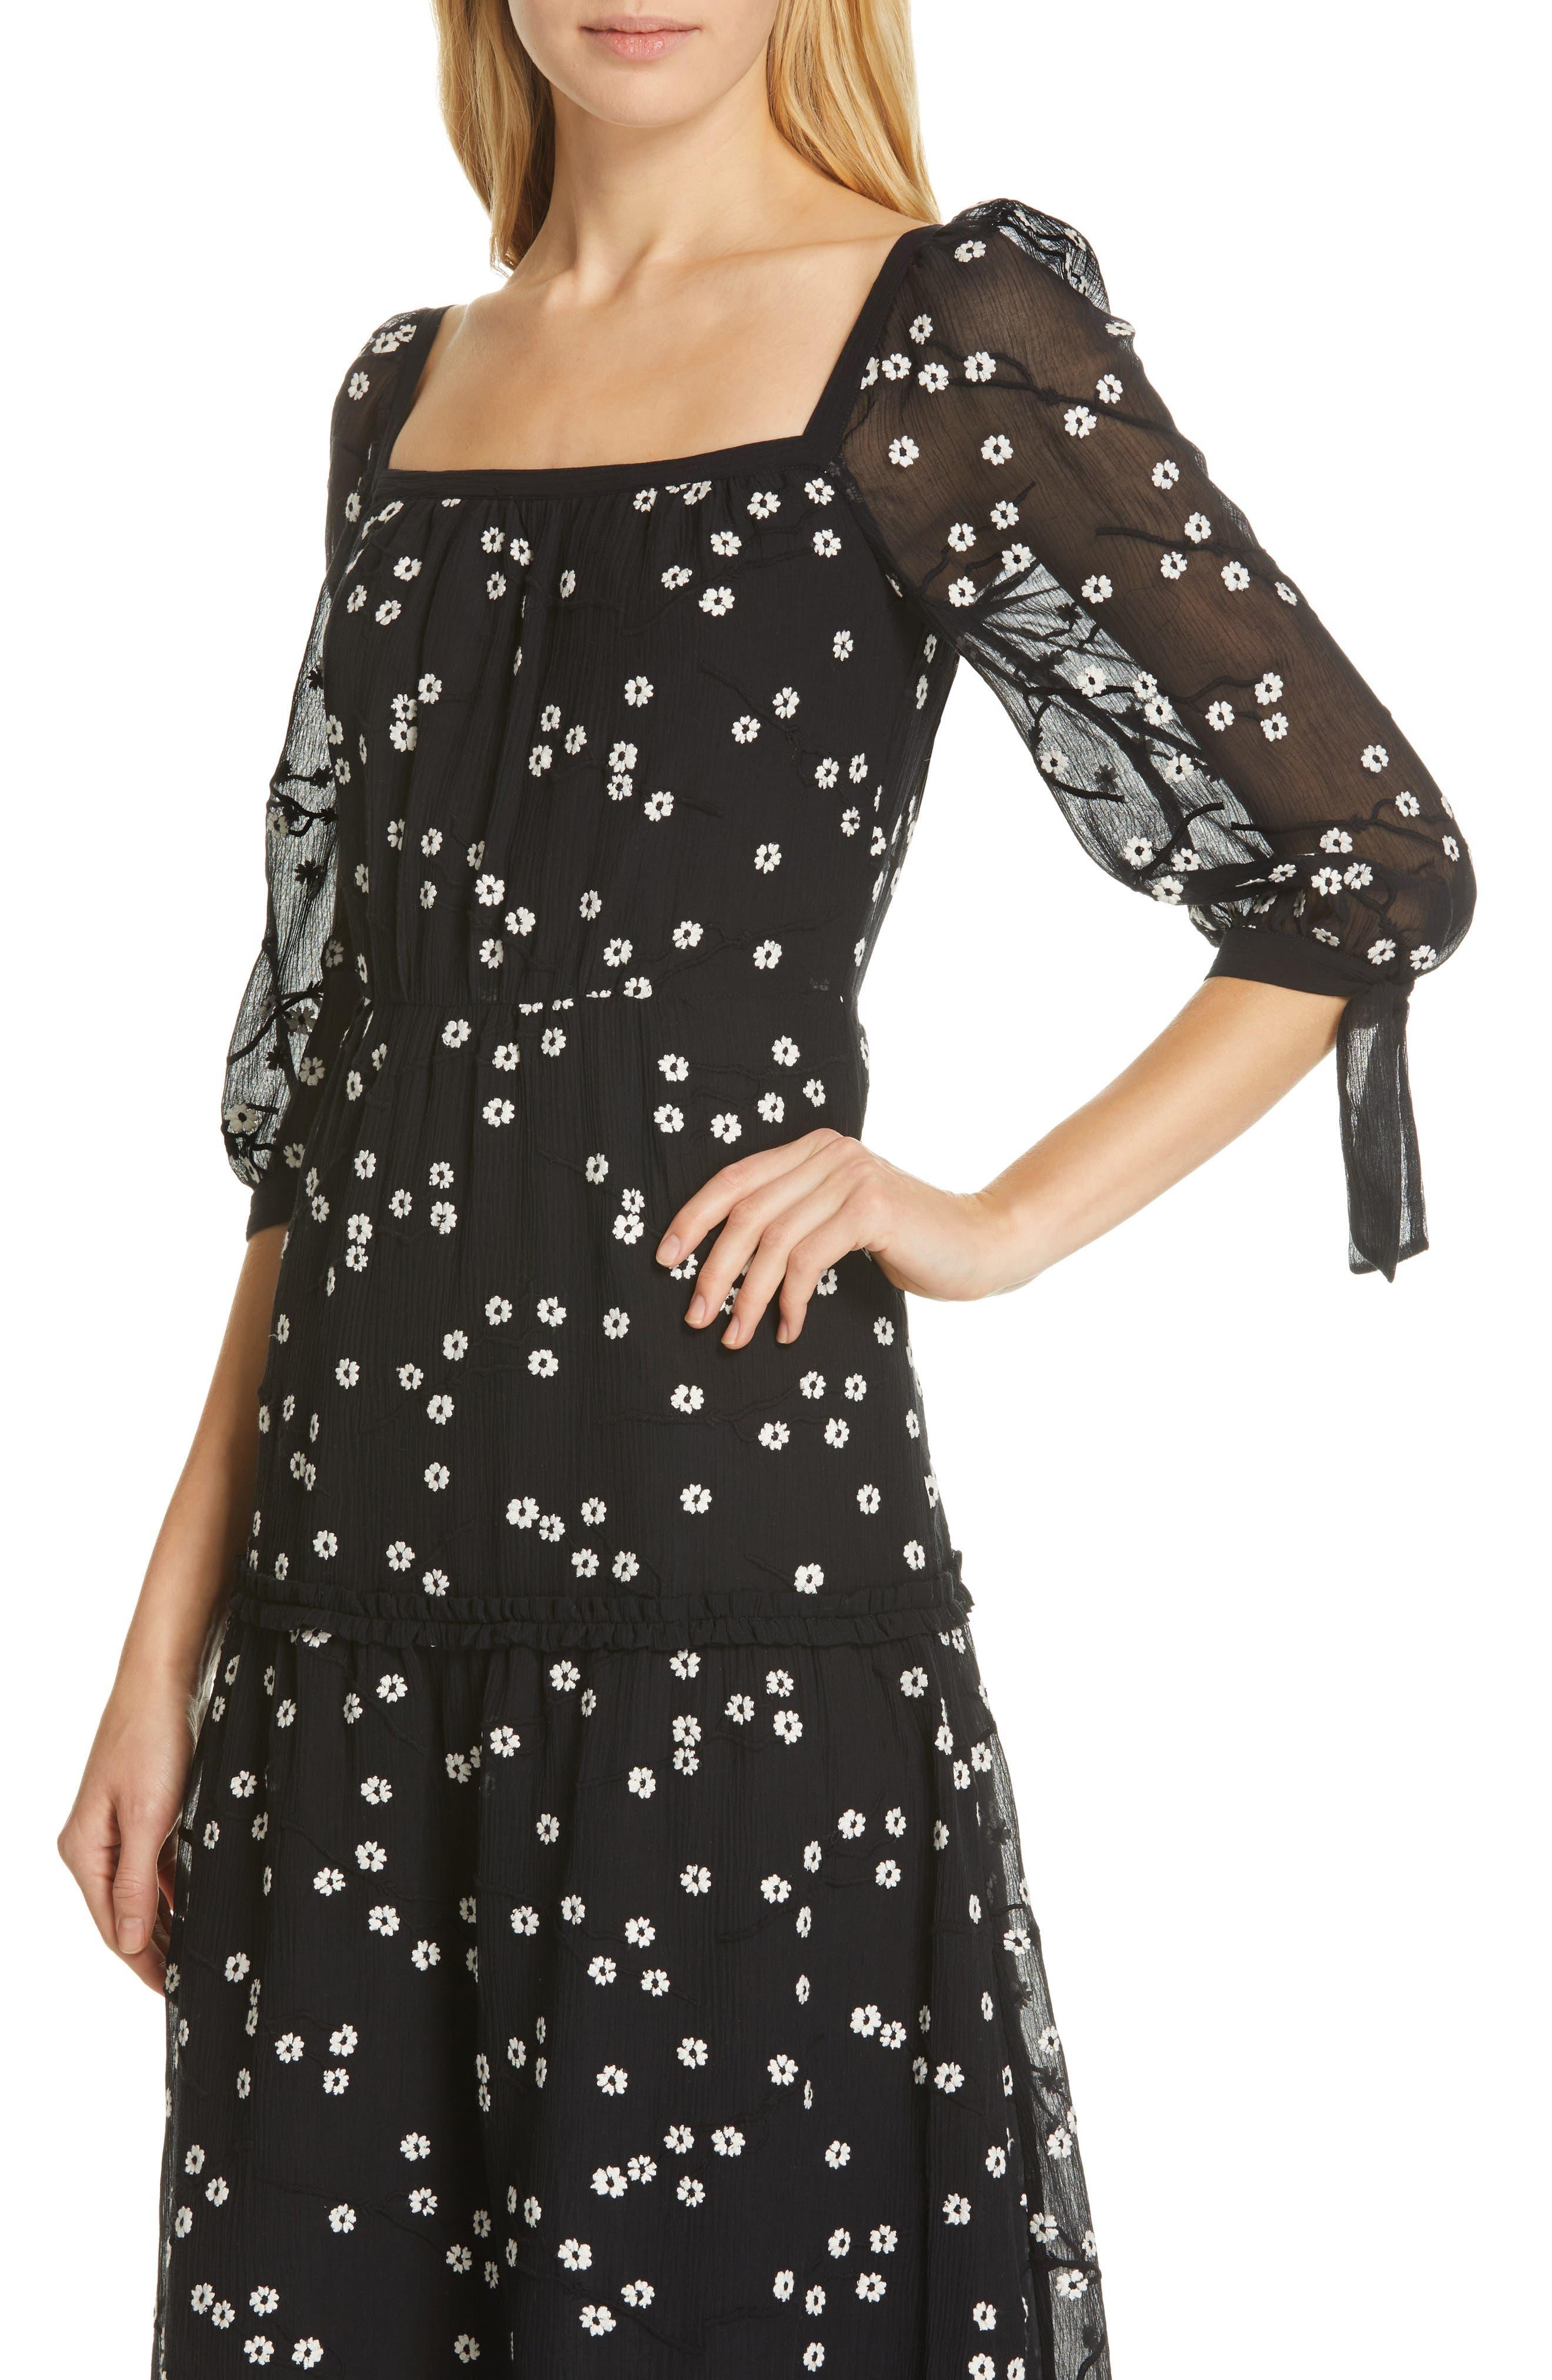 REBECCA TAYLOR, Allessandra Midi Dress, Alternate thumbnail 5, color, BLACK COMBO